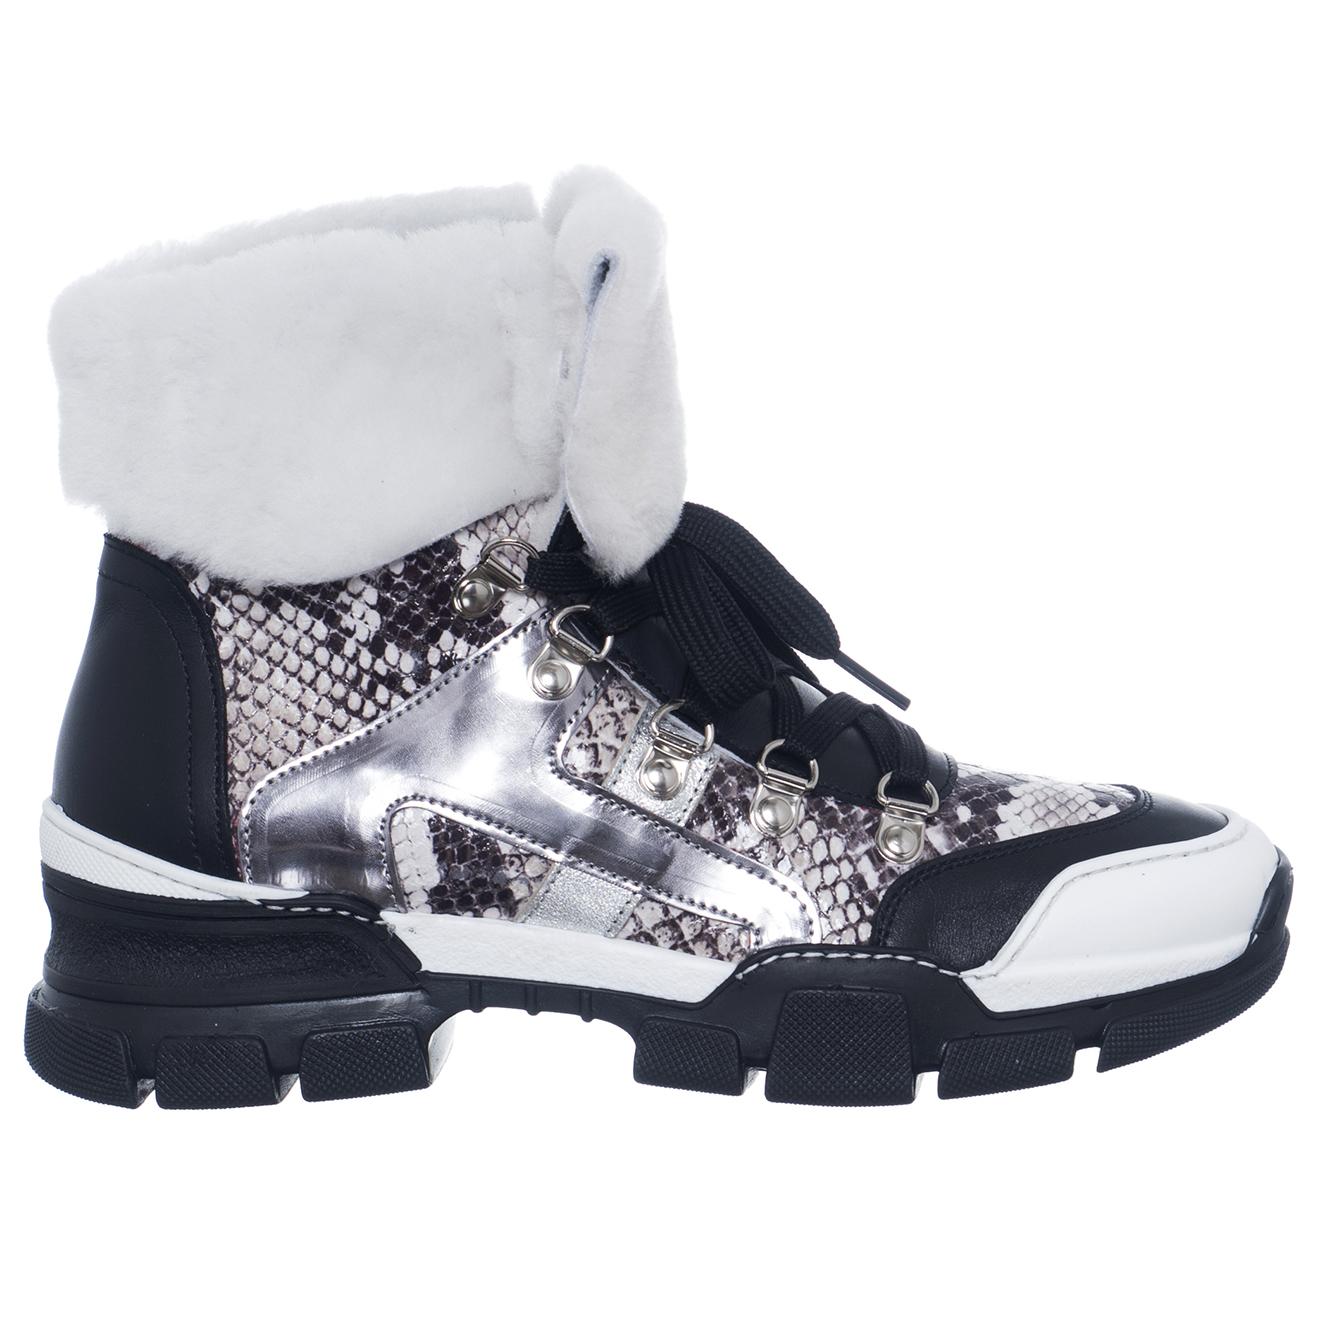 Sneakers en Cuir Victoria noir/gris/argenté - Loretta Pettinari - Modalova